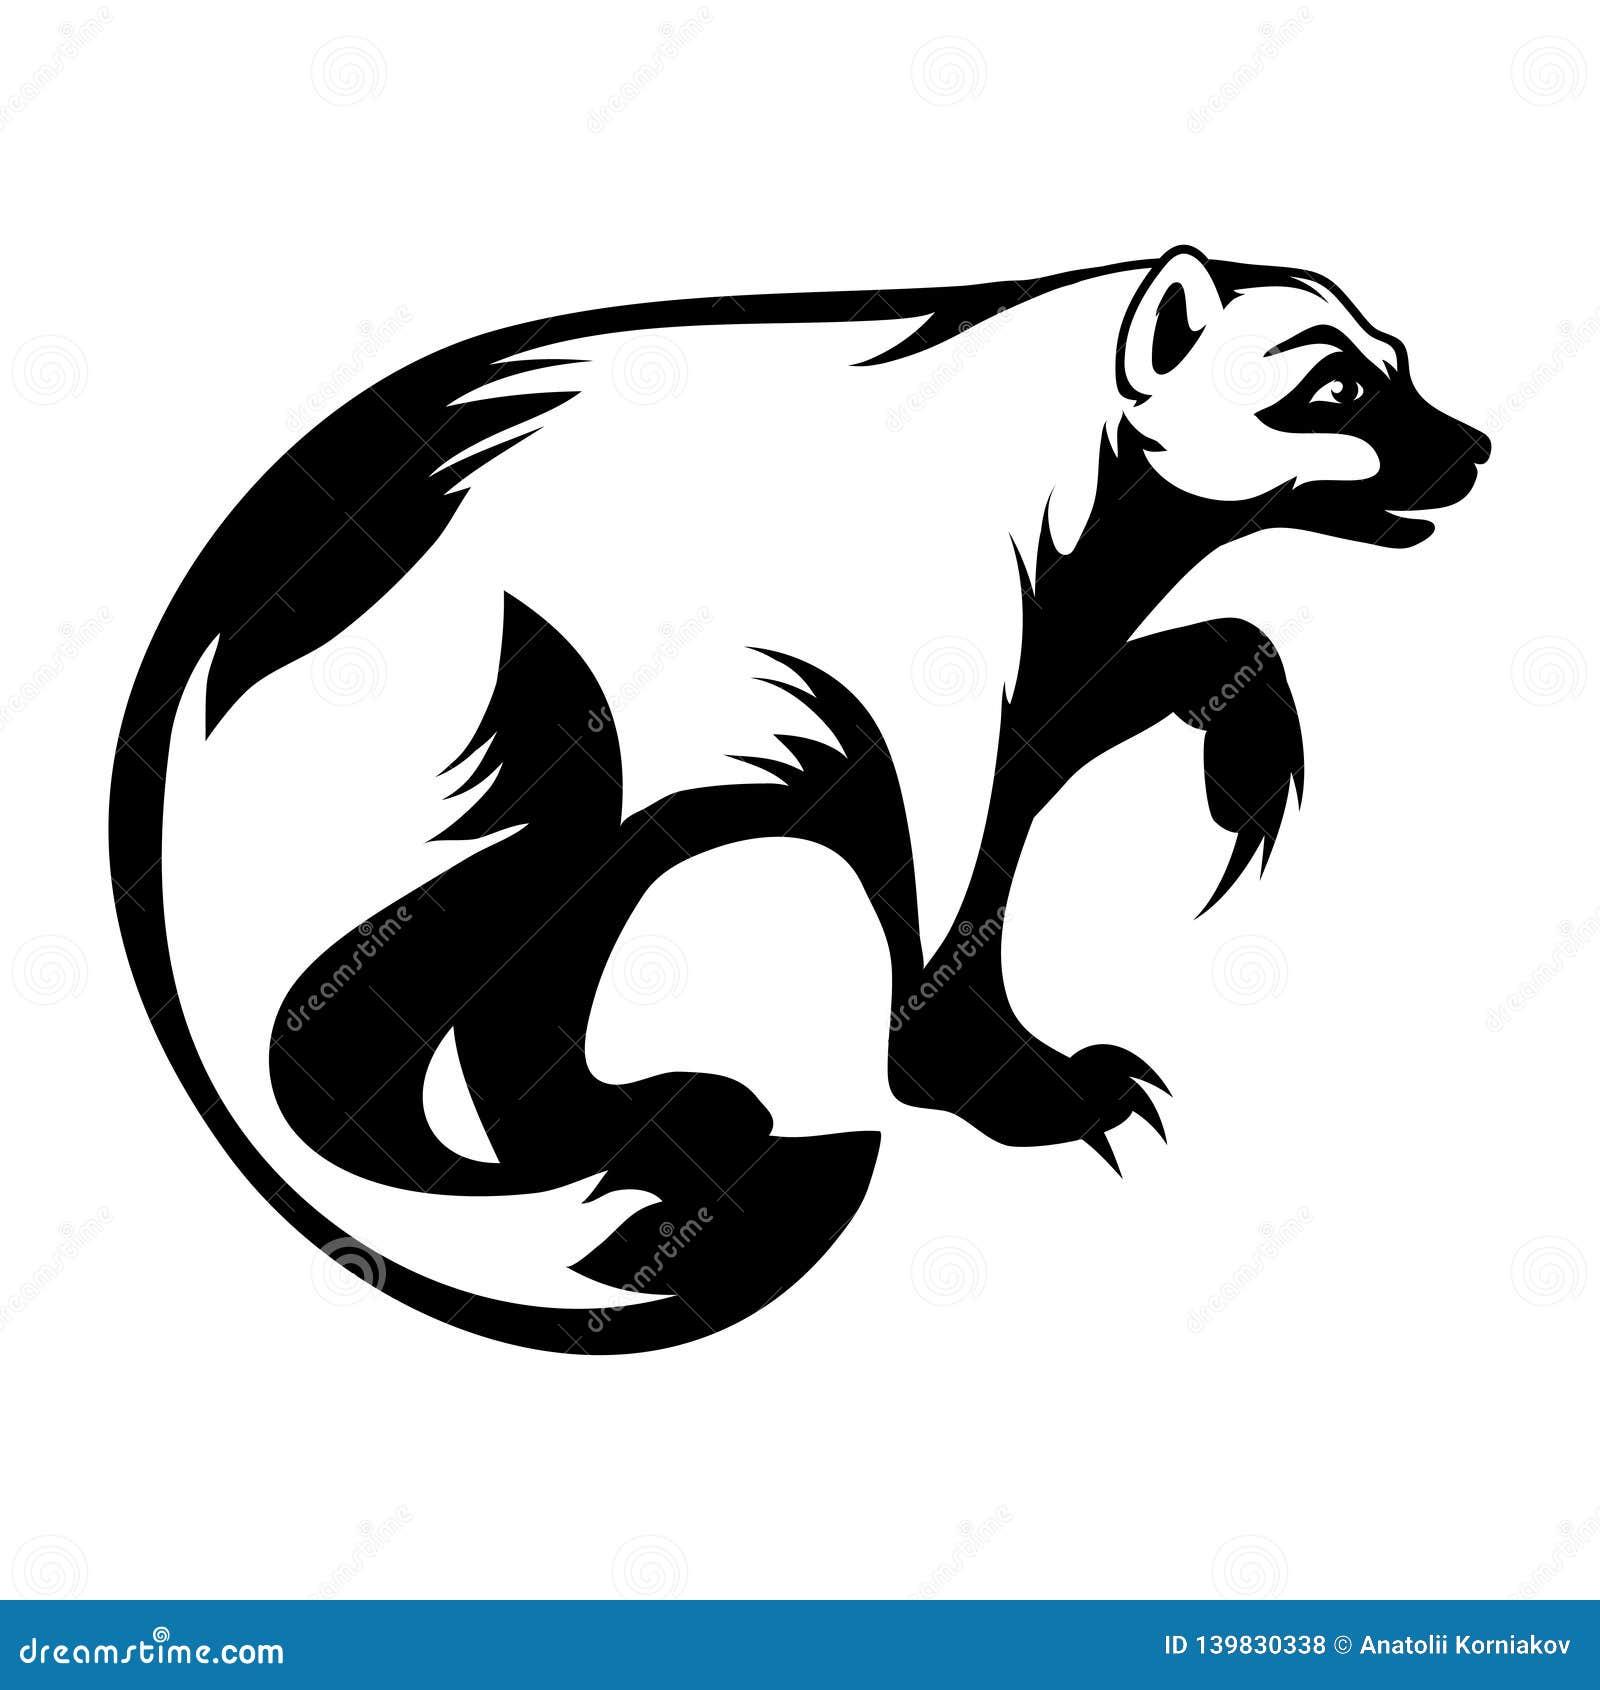 Logo De Wolverine Dessin De Vecteur Illustration De Vecteur Illustration Du Dessin Vecteur 139830338